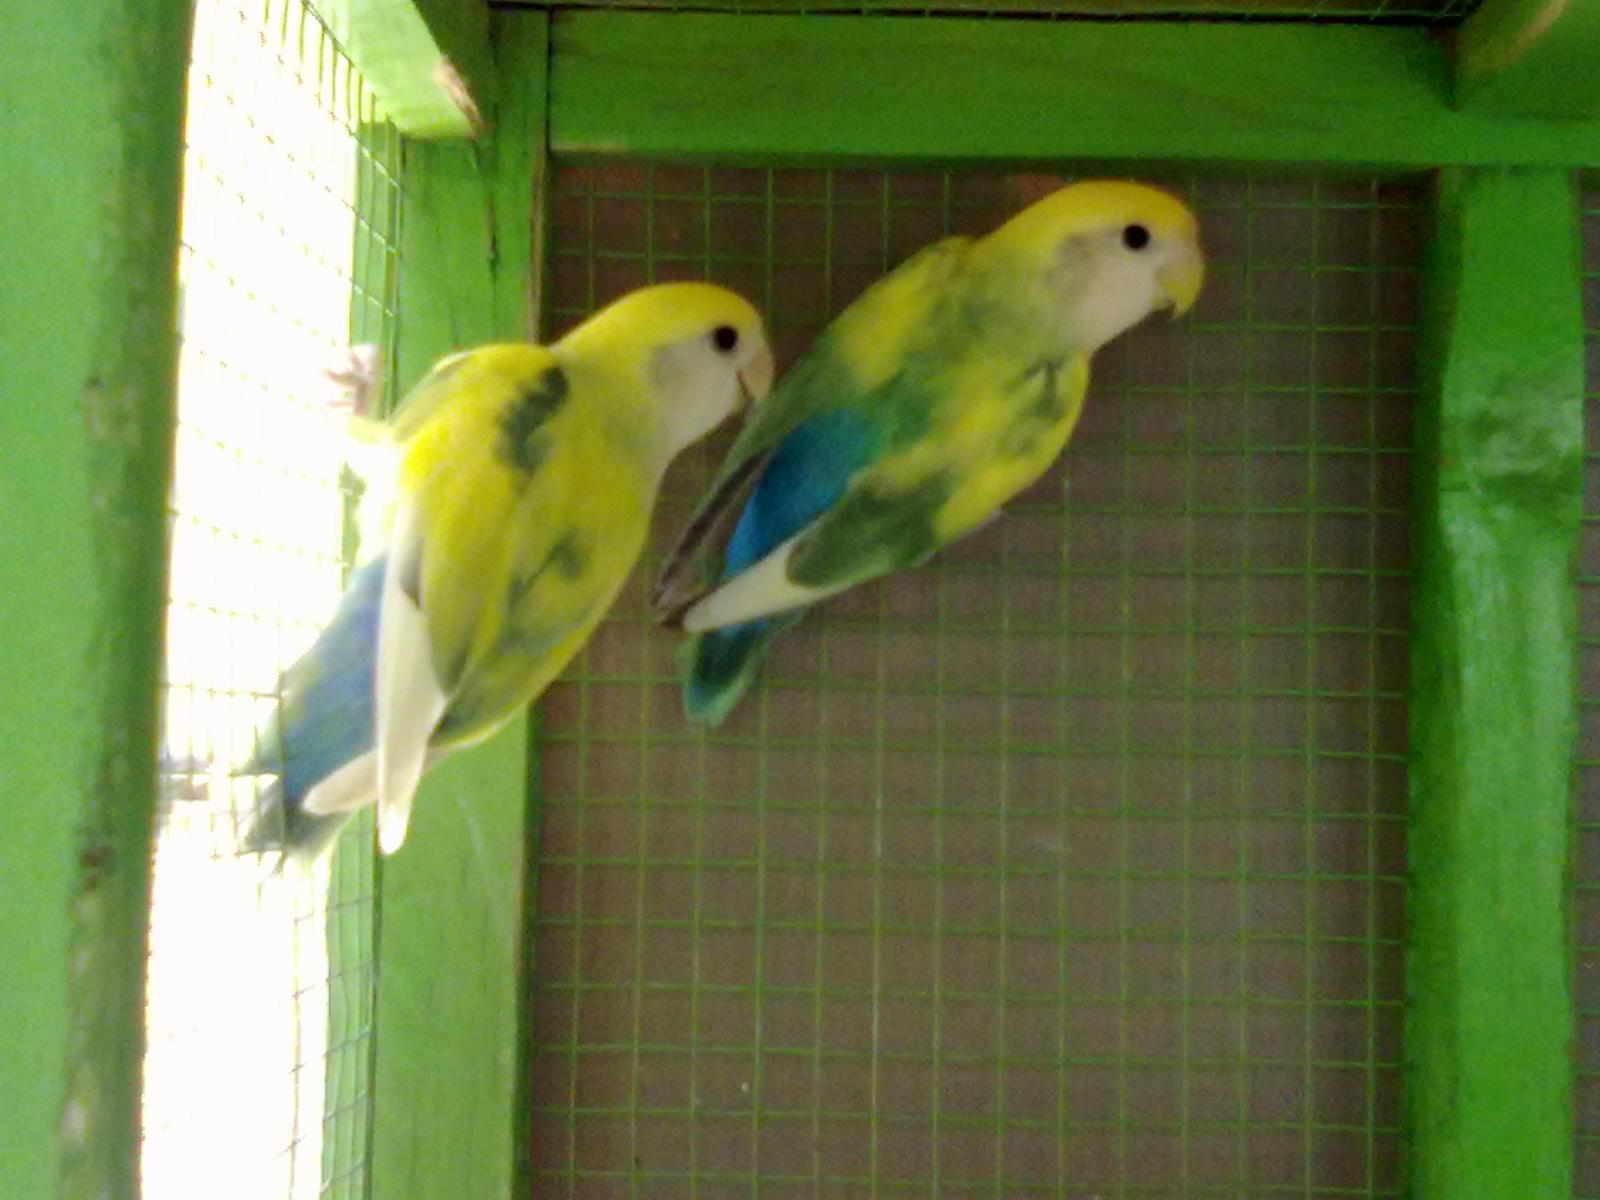 gambar lovebird biru langit   koleksi gambar hd